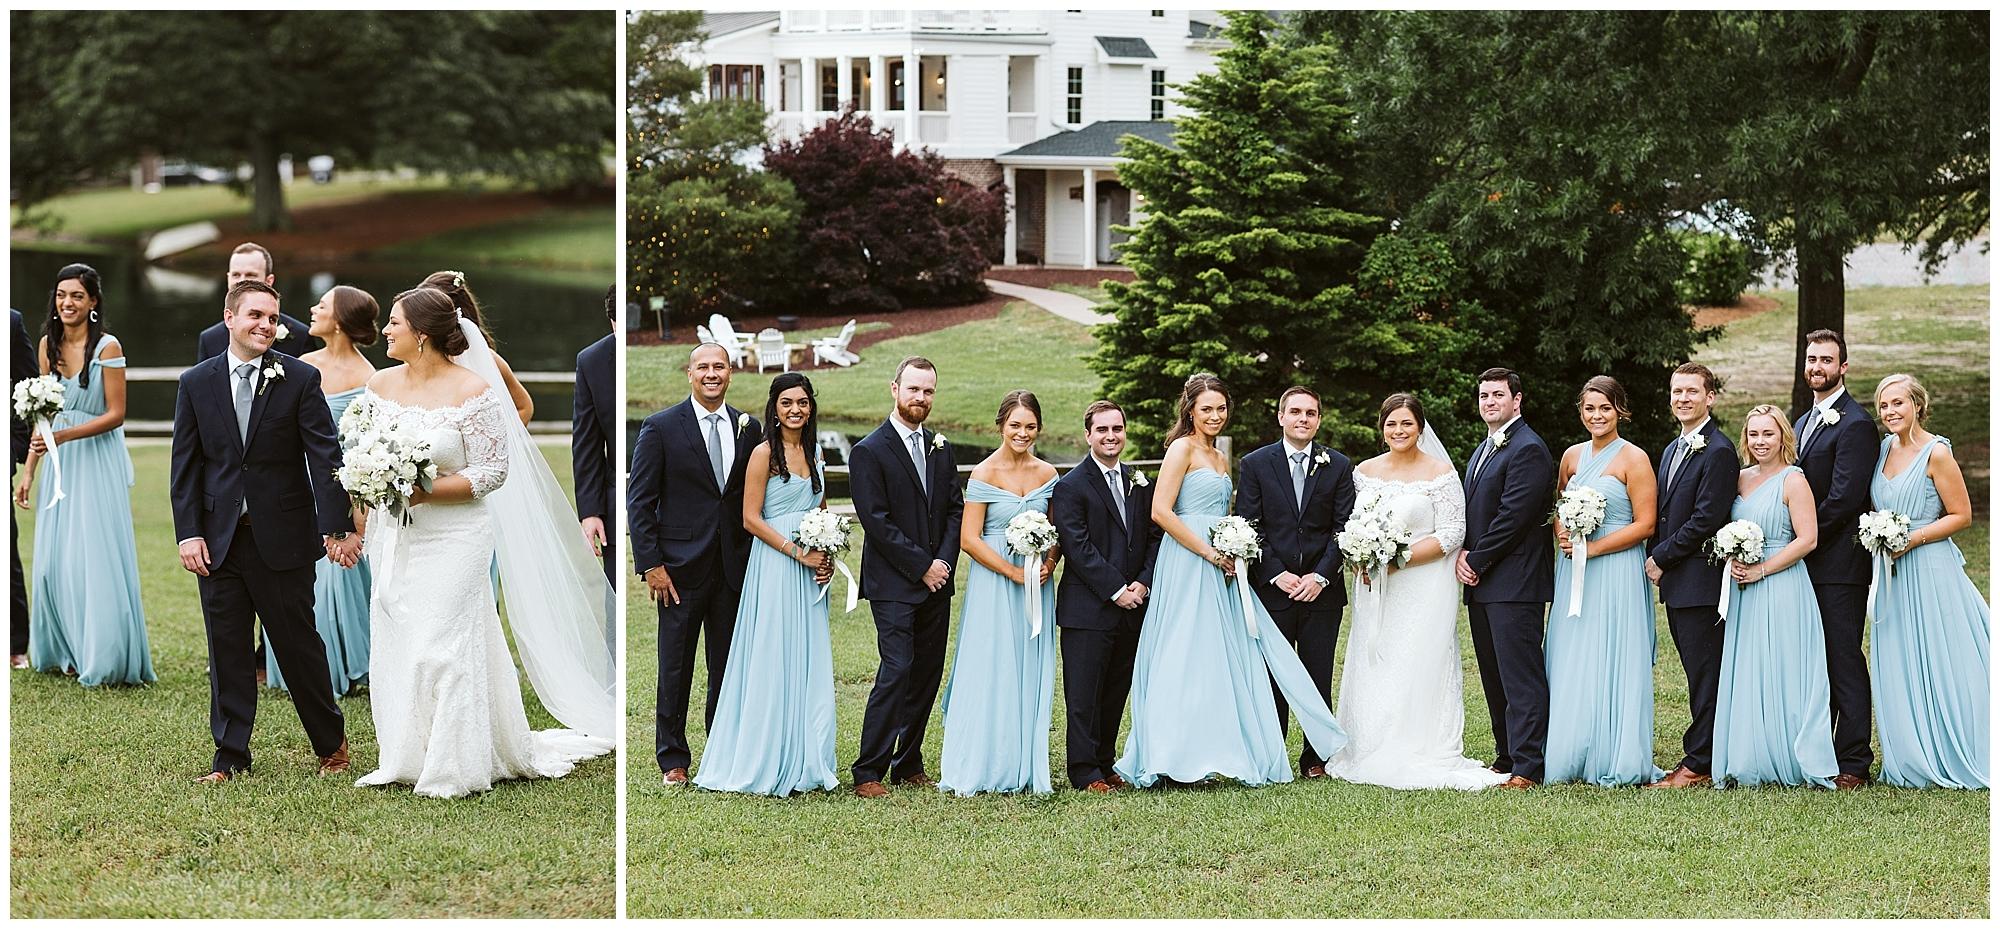 Oaks-at-salem-wedding-apex-photography-75.jpg